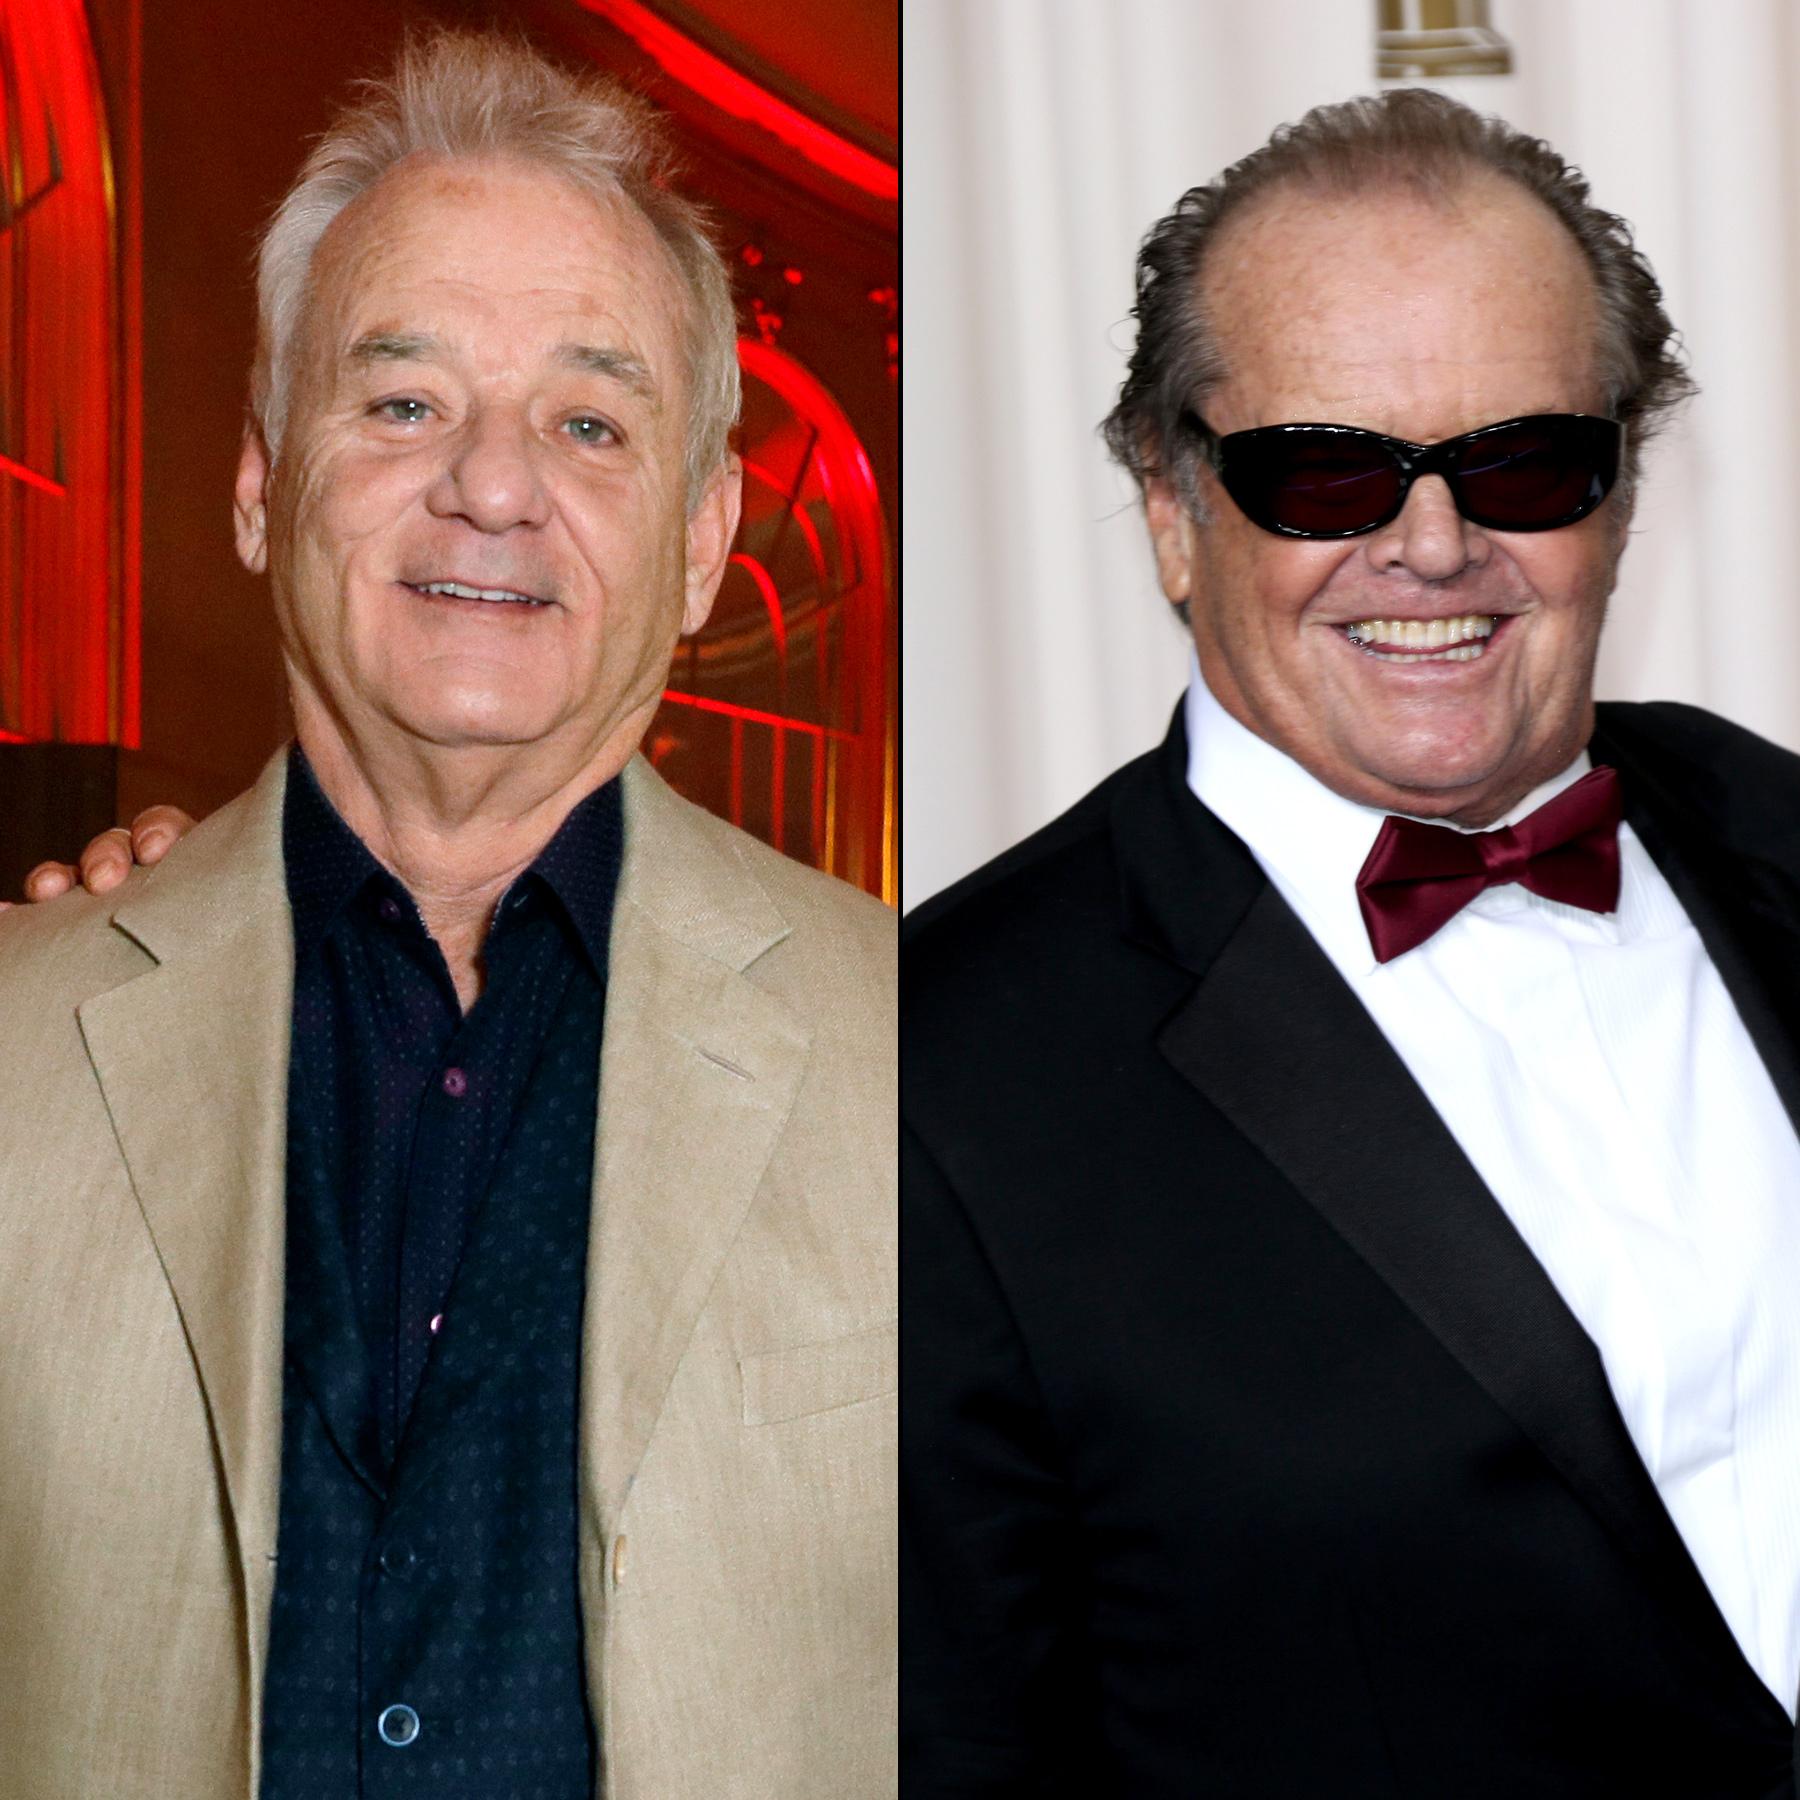 Bill Murray and Jack Nicholson